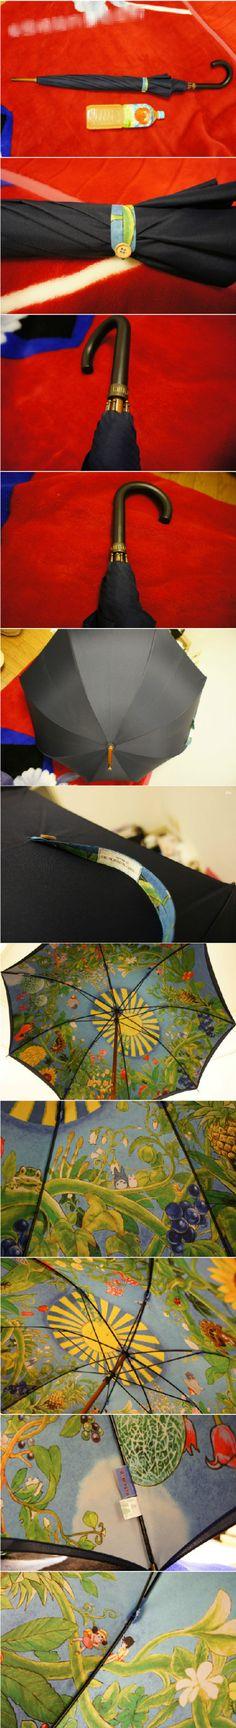 Umbrella - Miyazaki Hayao